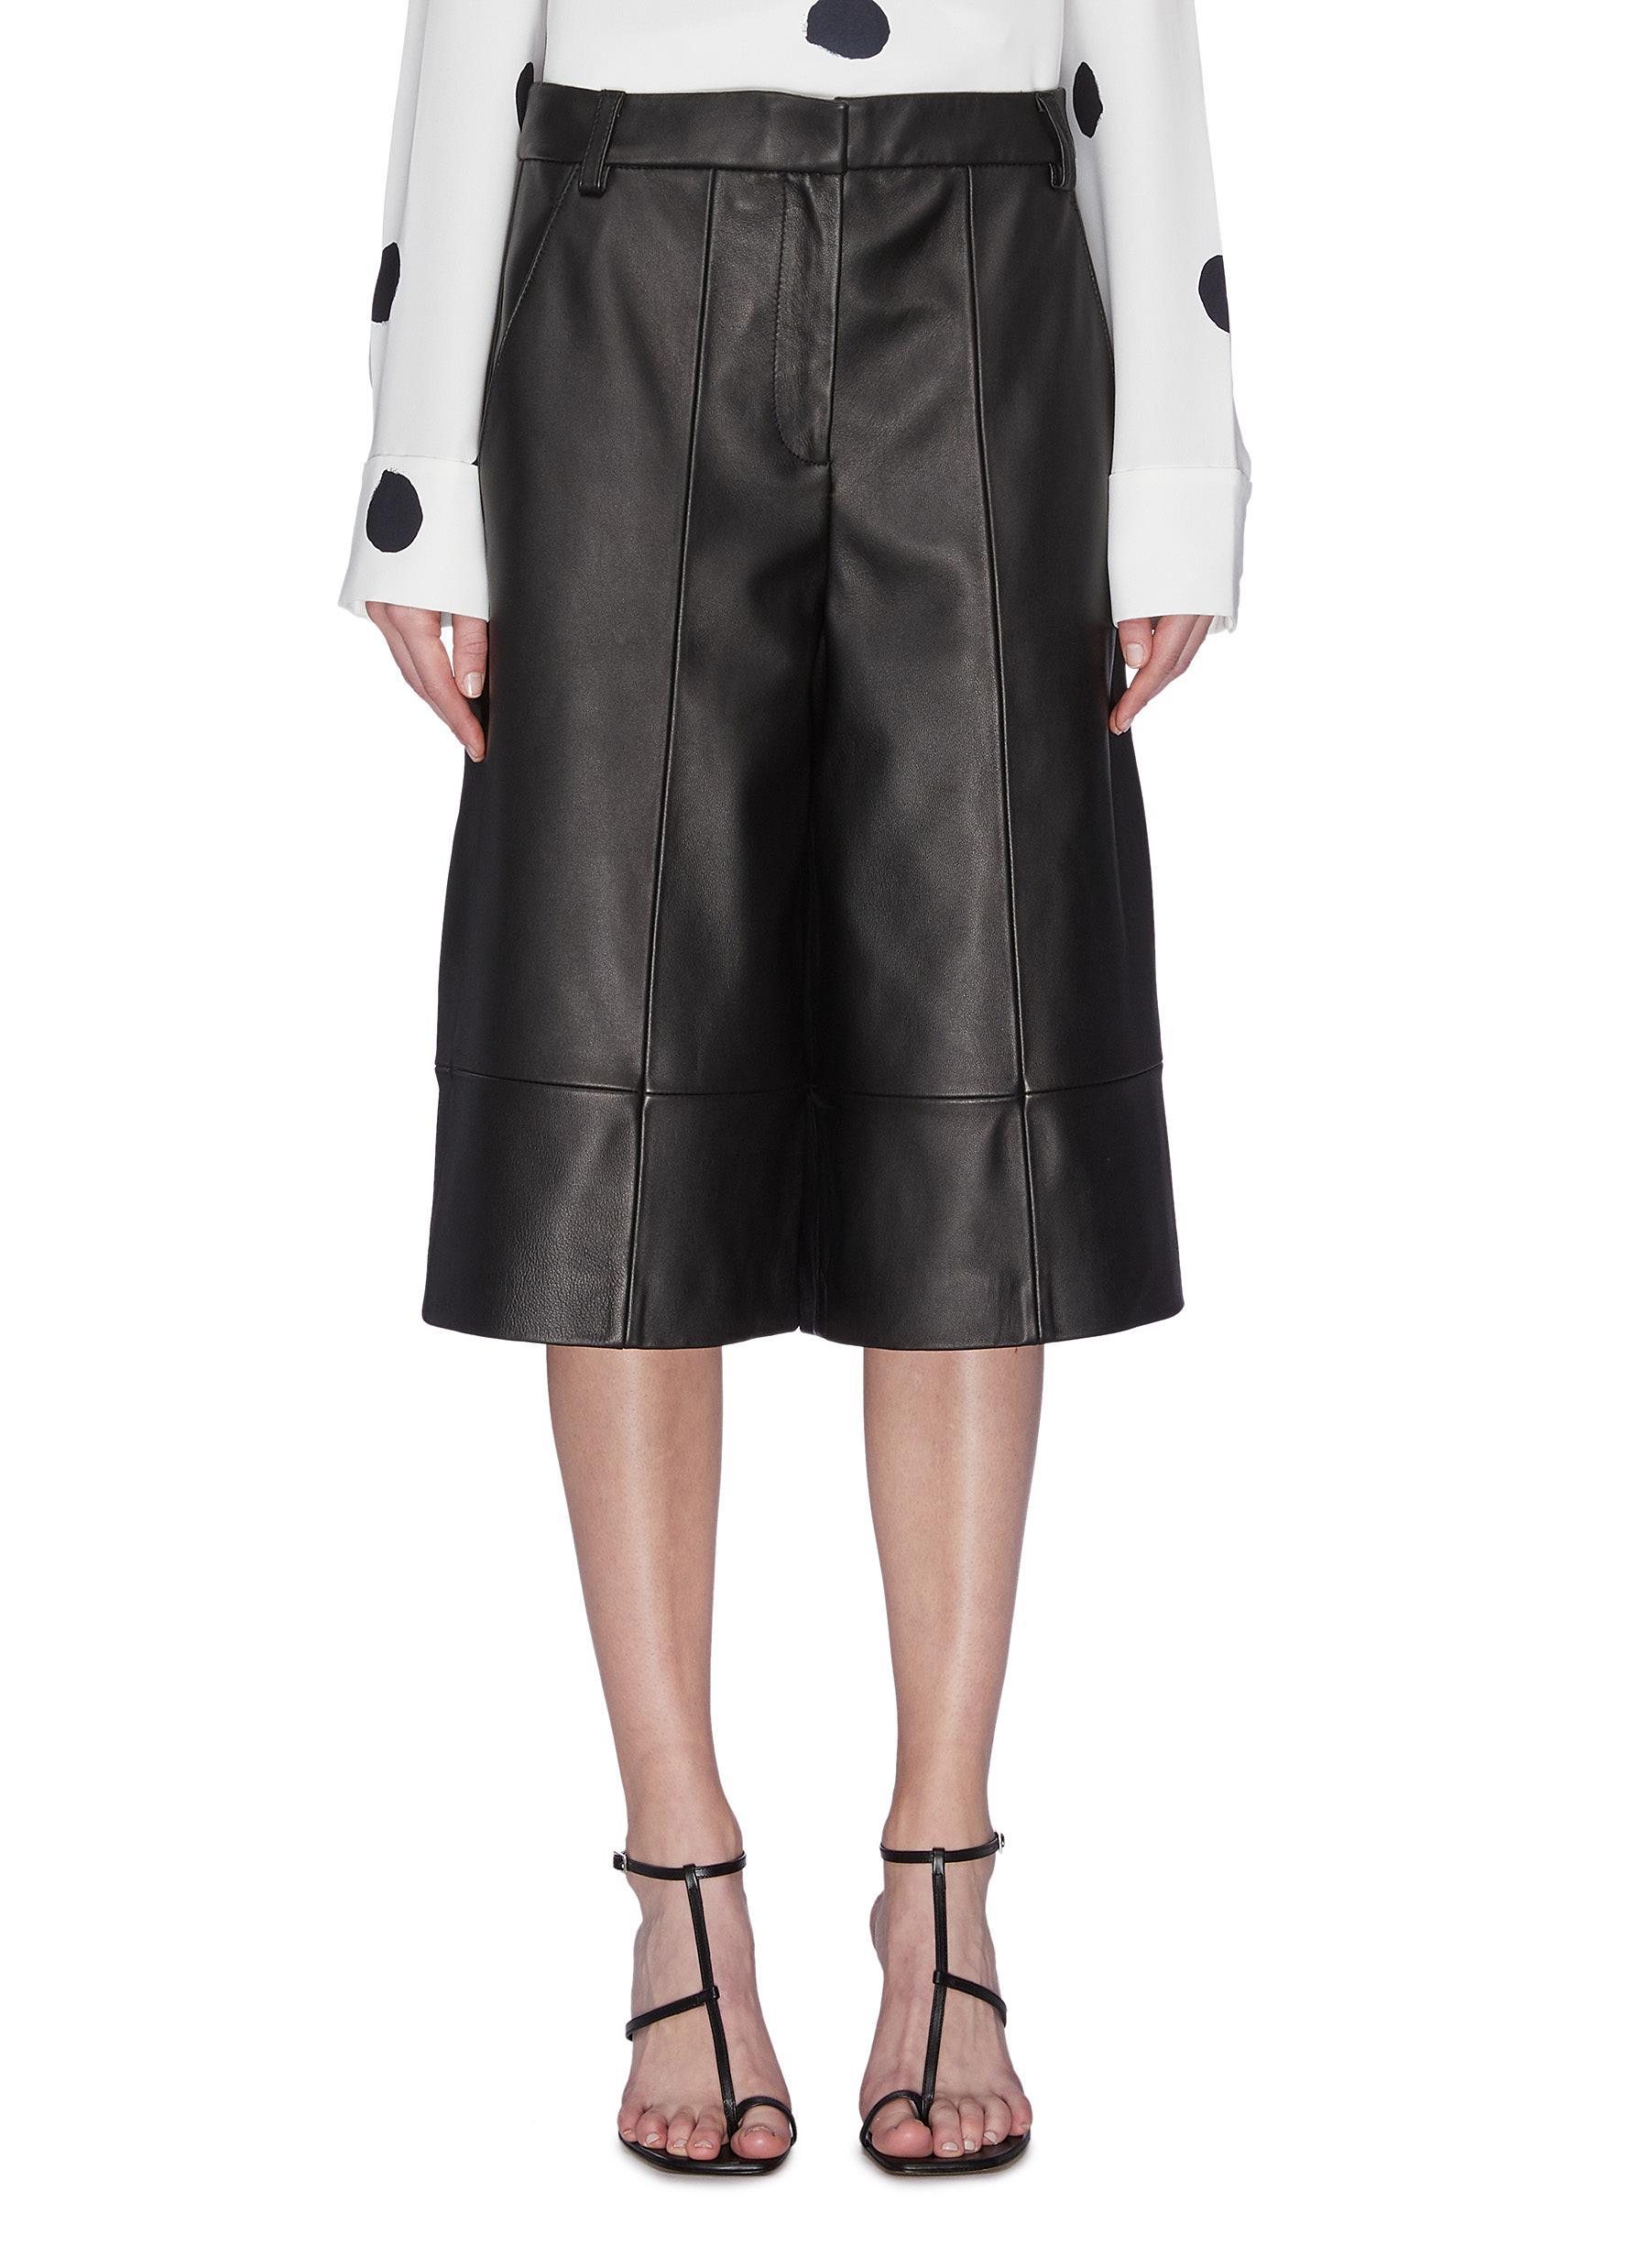 Buy Tibi Pants & Shorts Leather knee length shorts